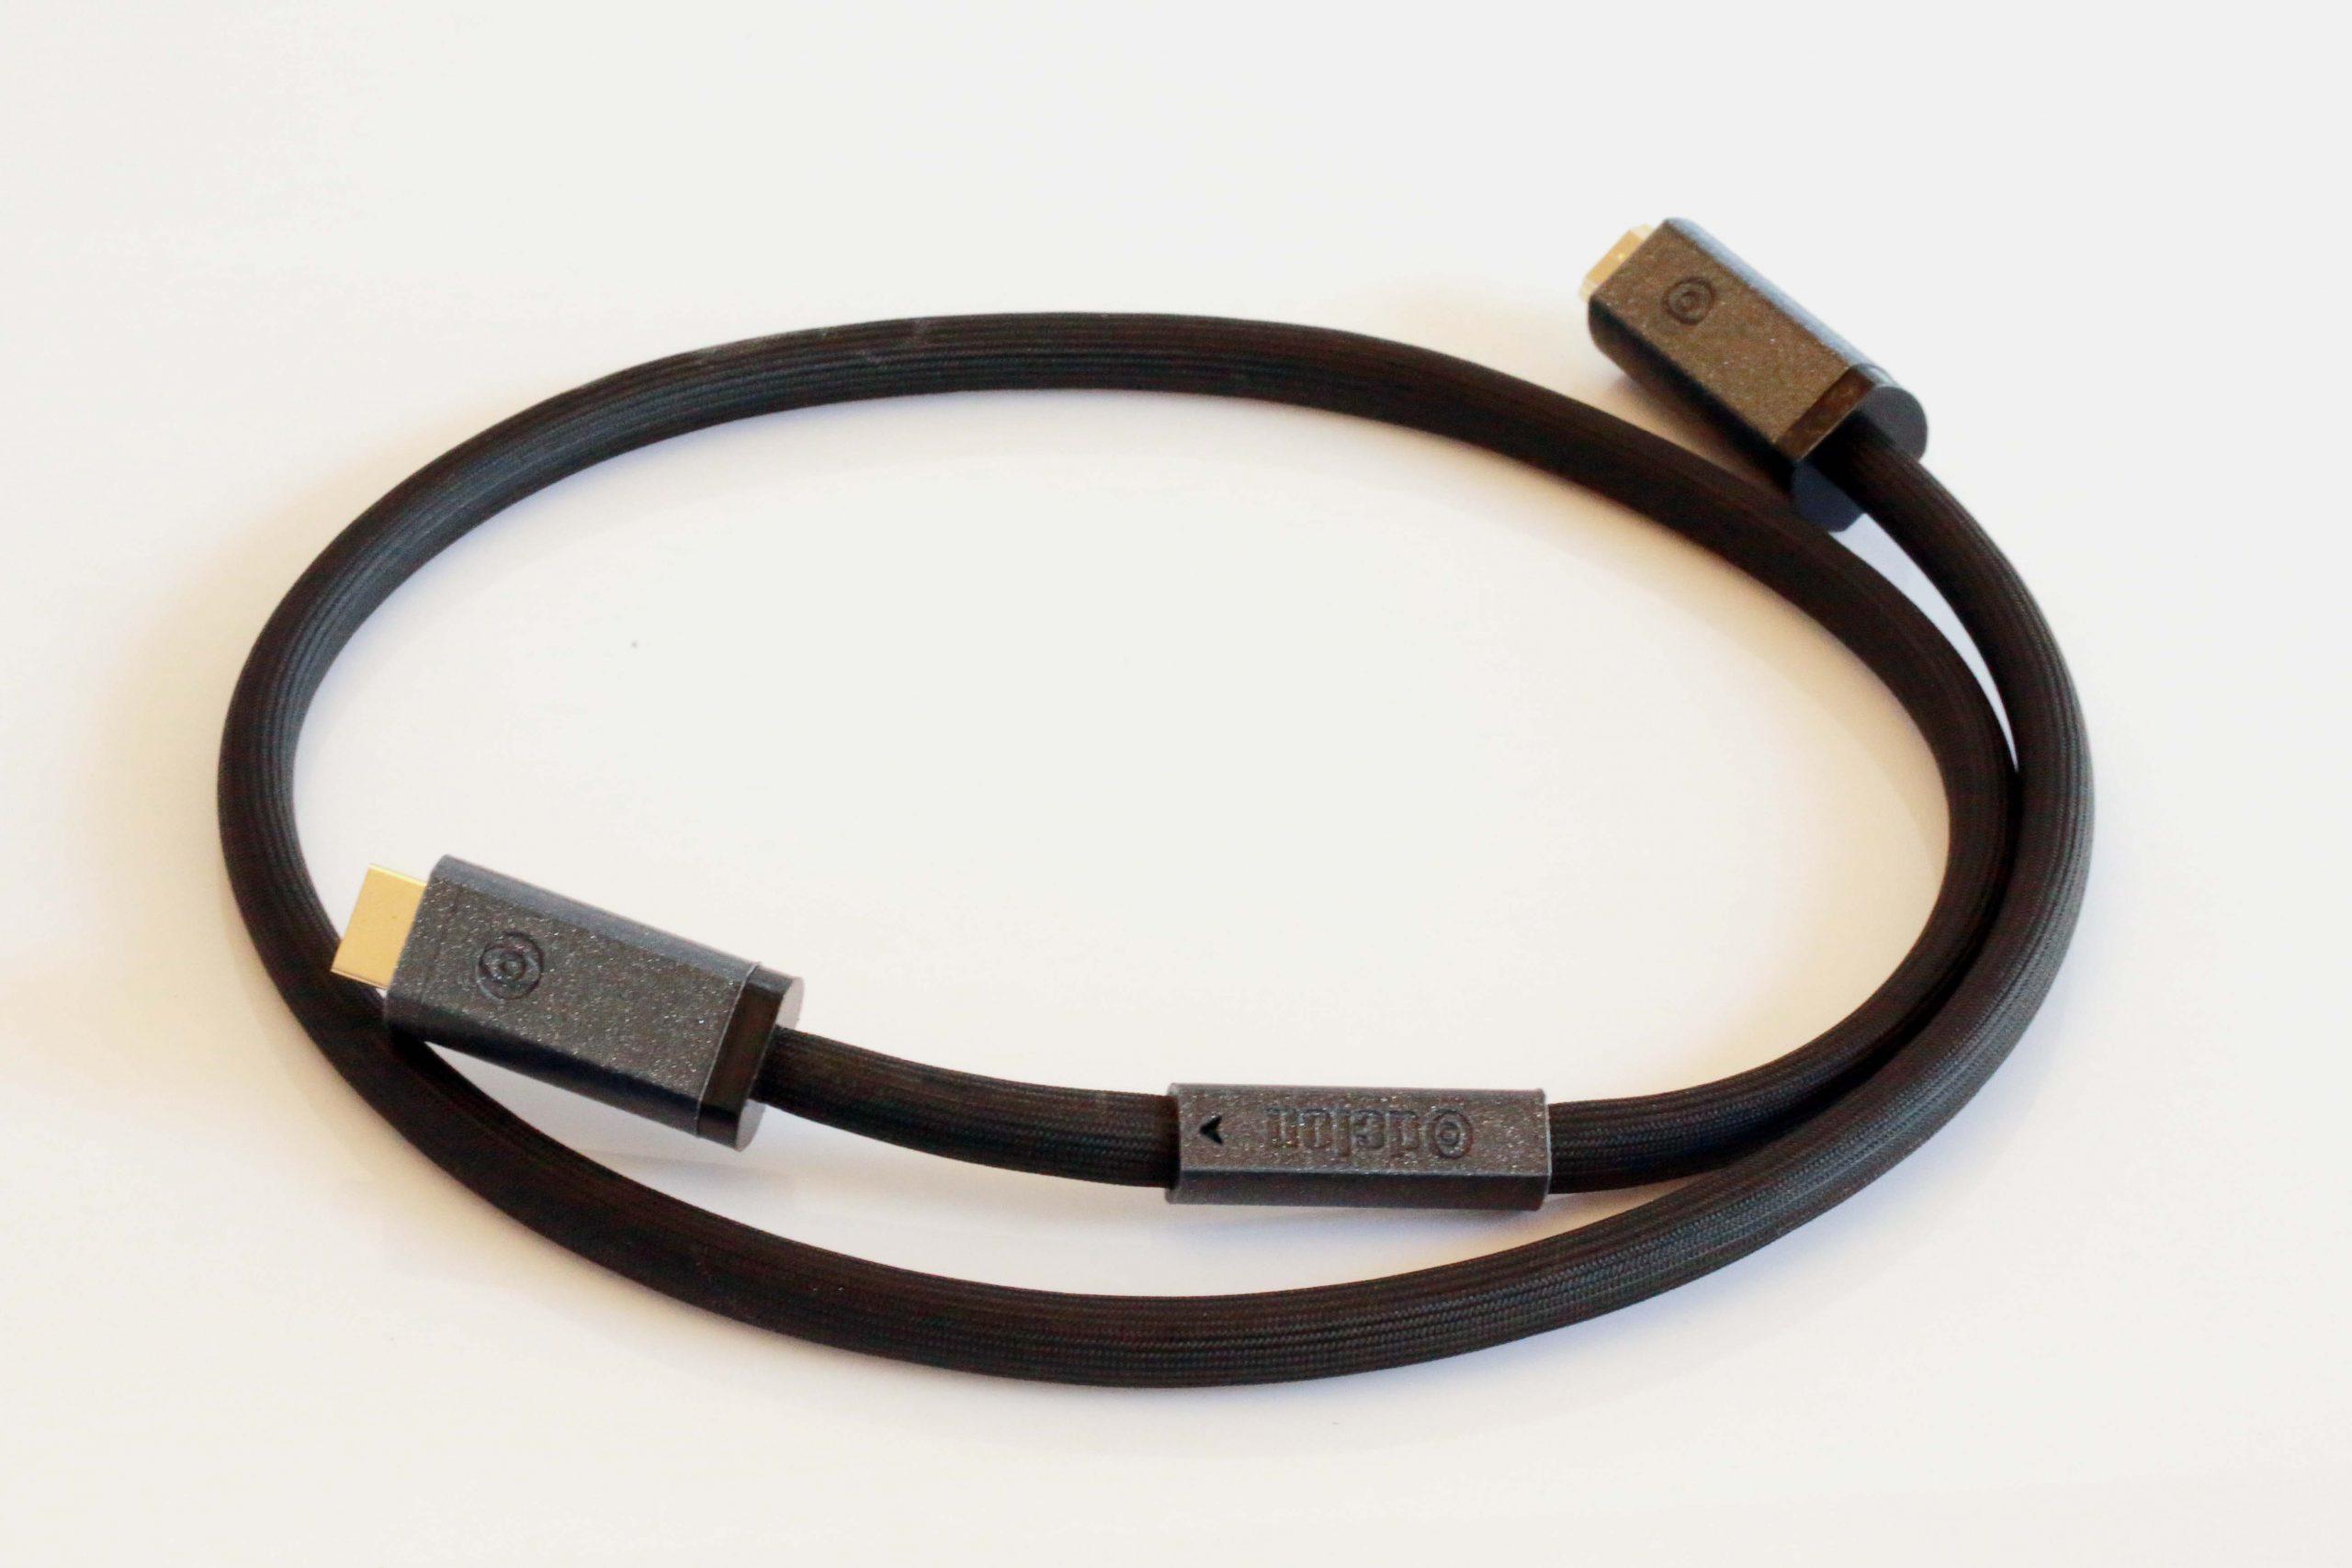 omicron hdmi numerique digital Odeion Cables